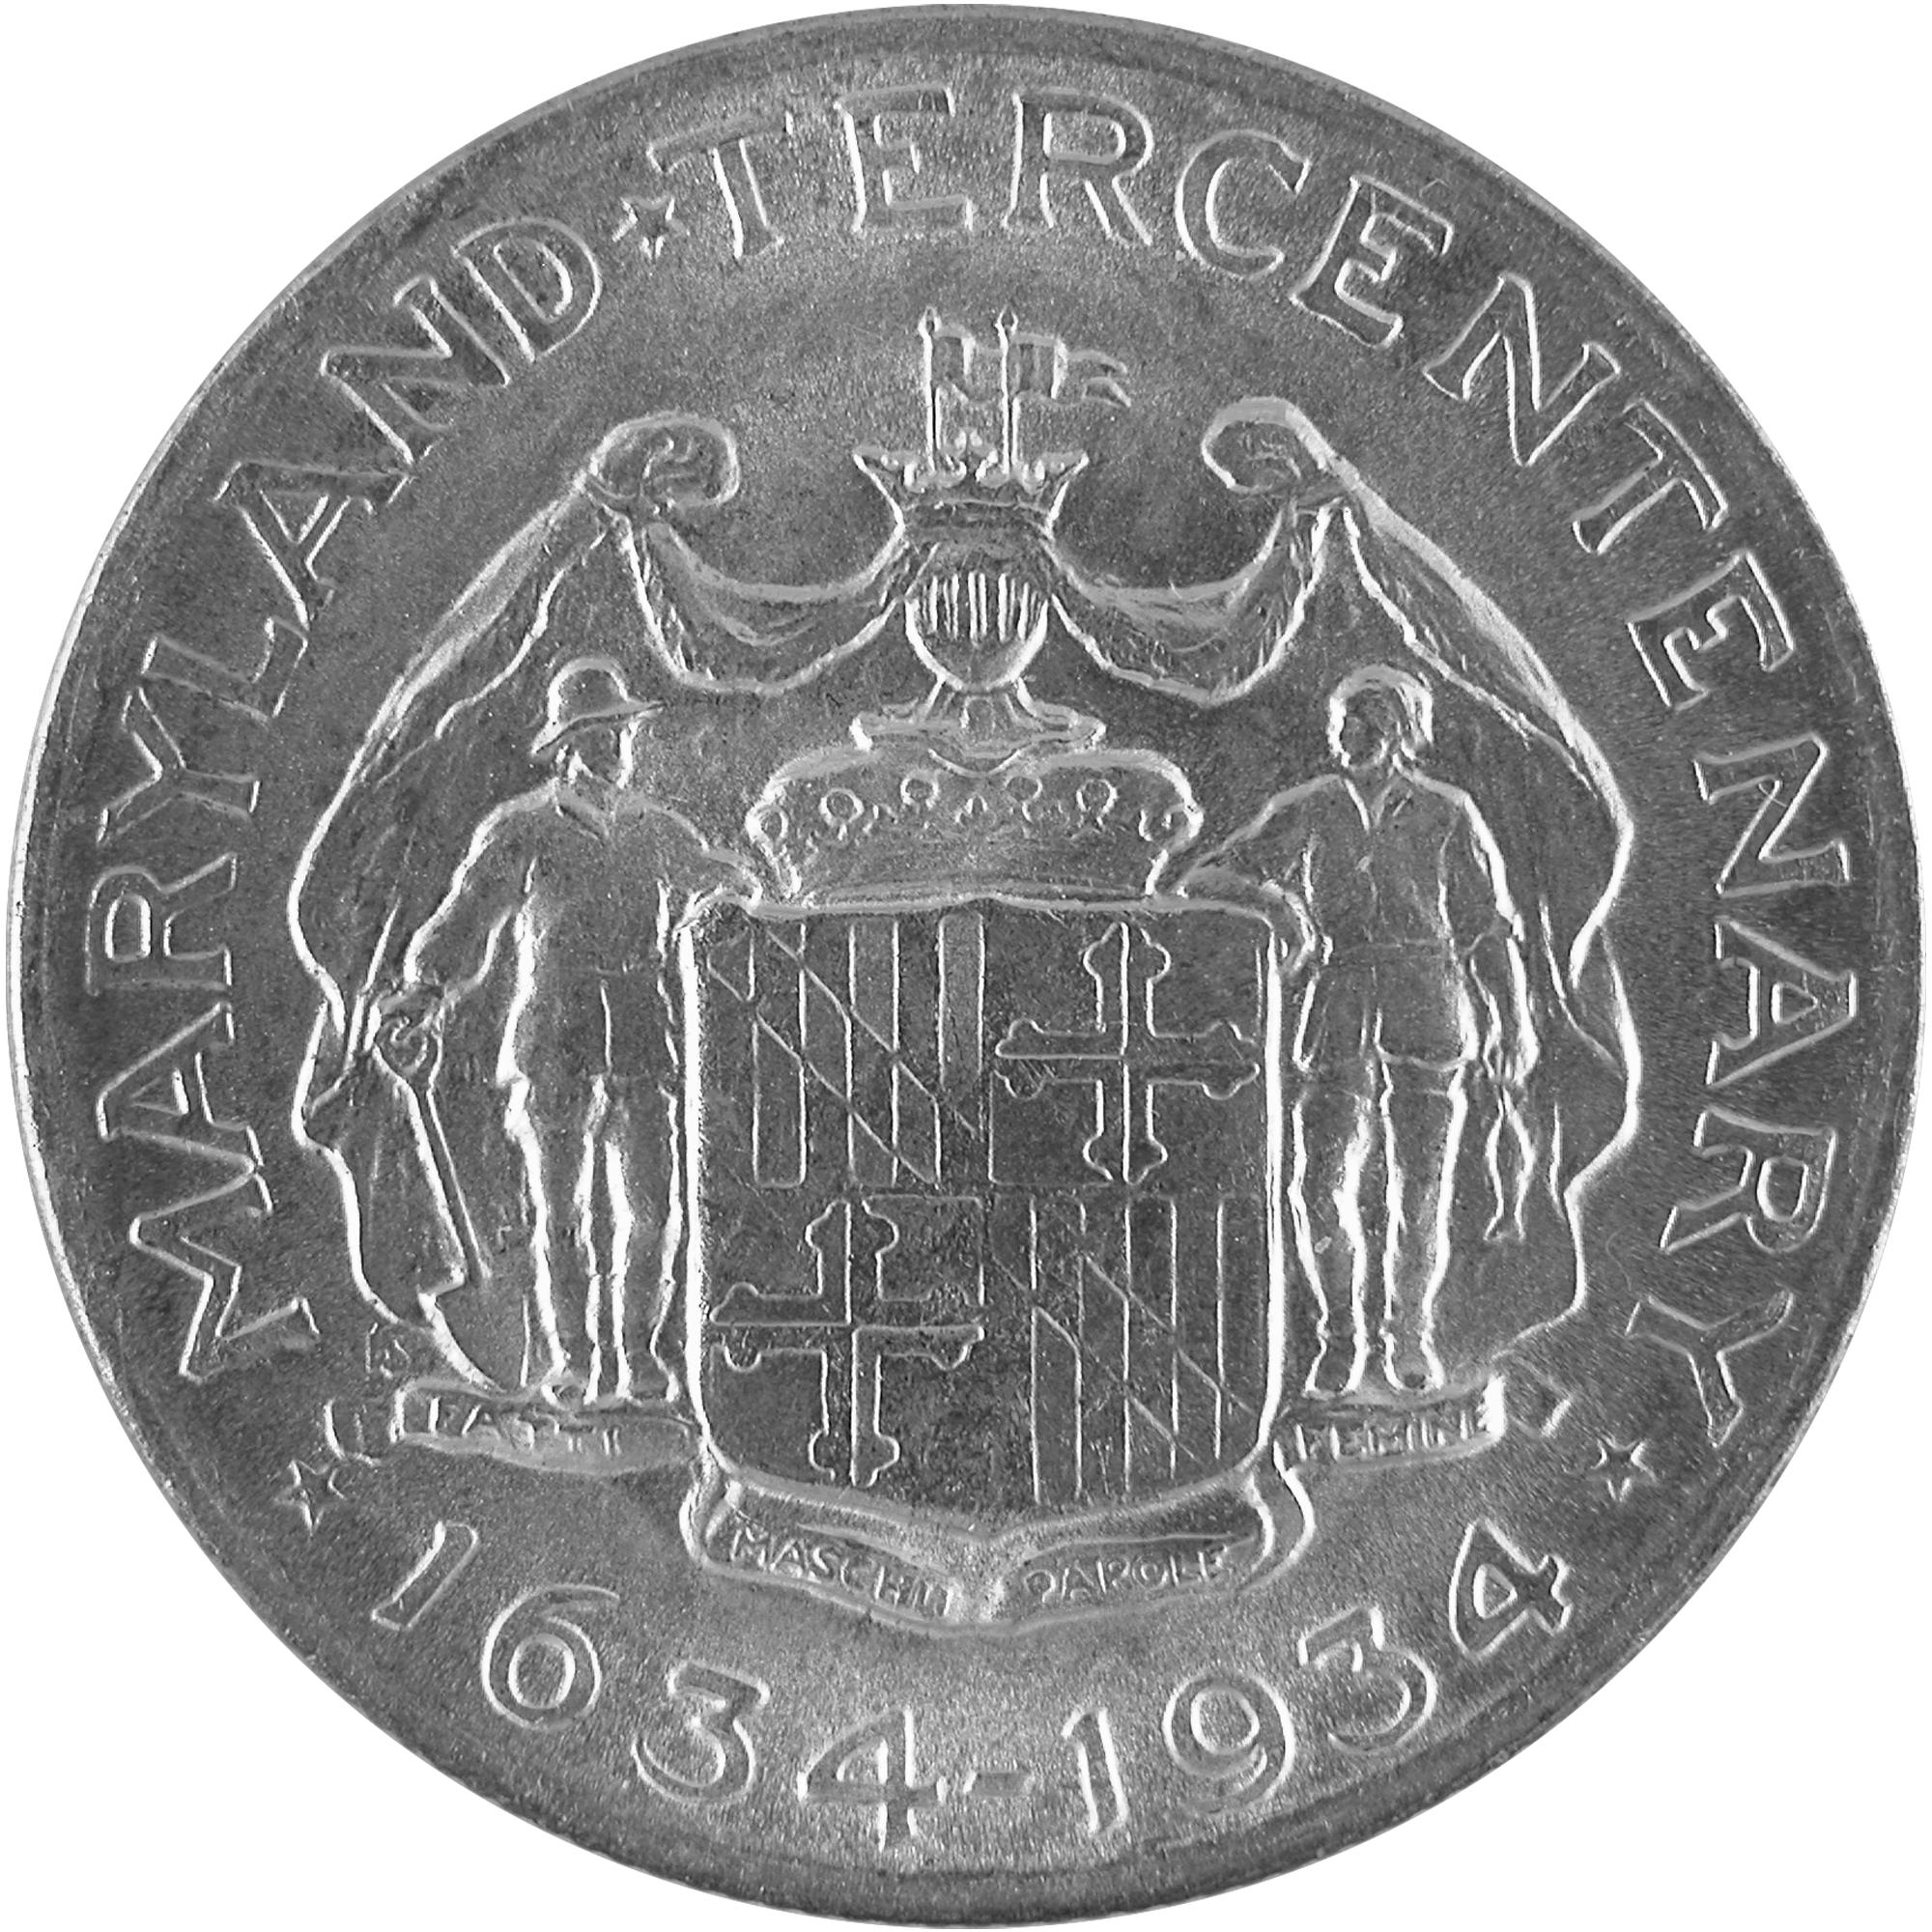 1934 Maryland Tercentenary Commemorative Silver Half Dollar Coin Reverse